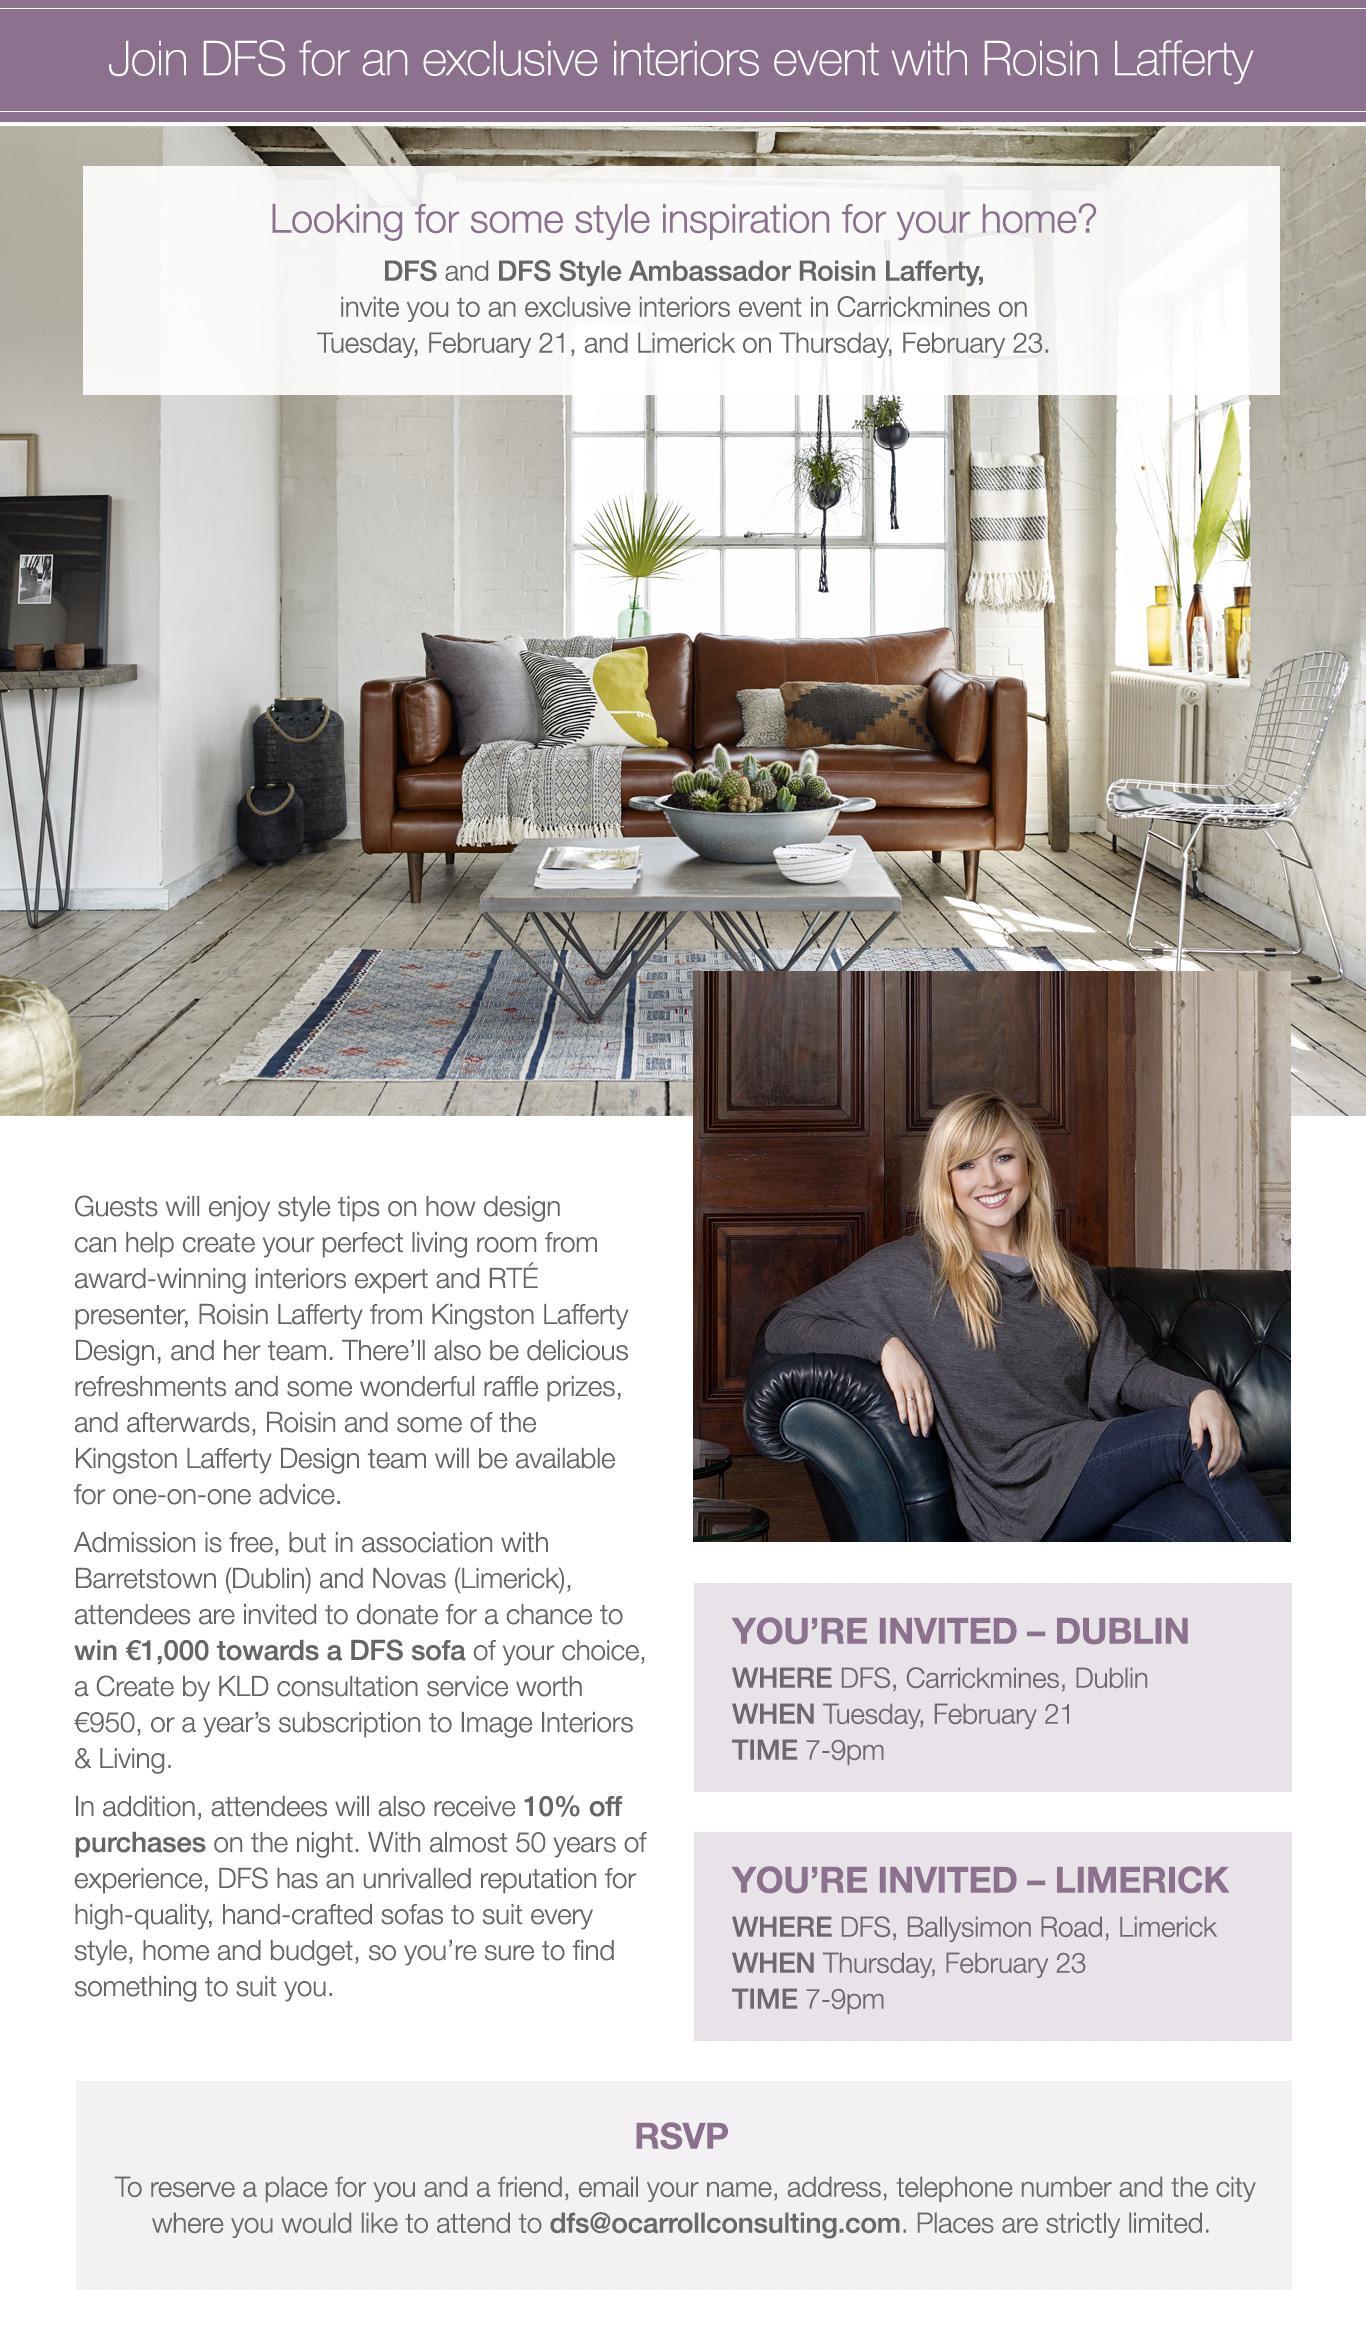 DFS Style Ambassador Roisin Lafferty | DFS Ireland